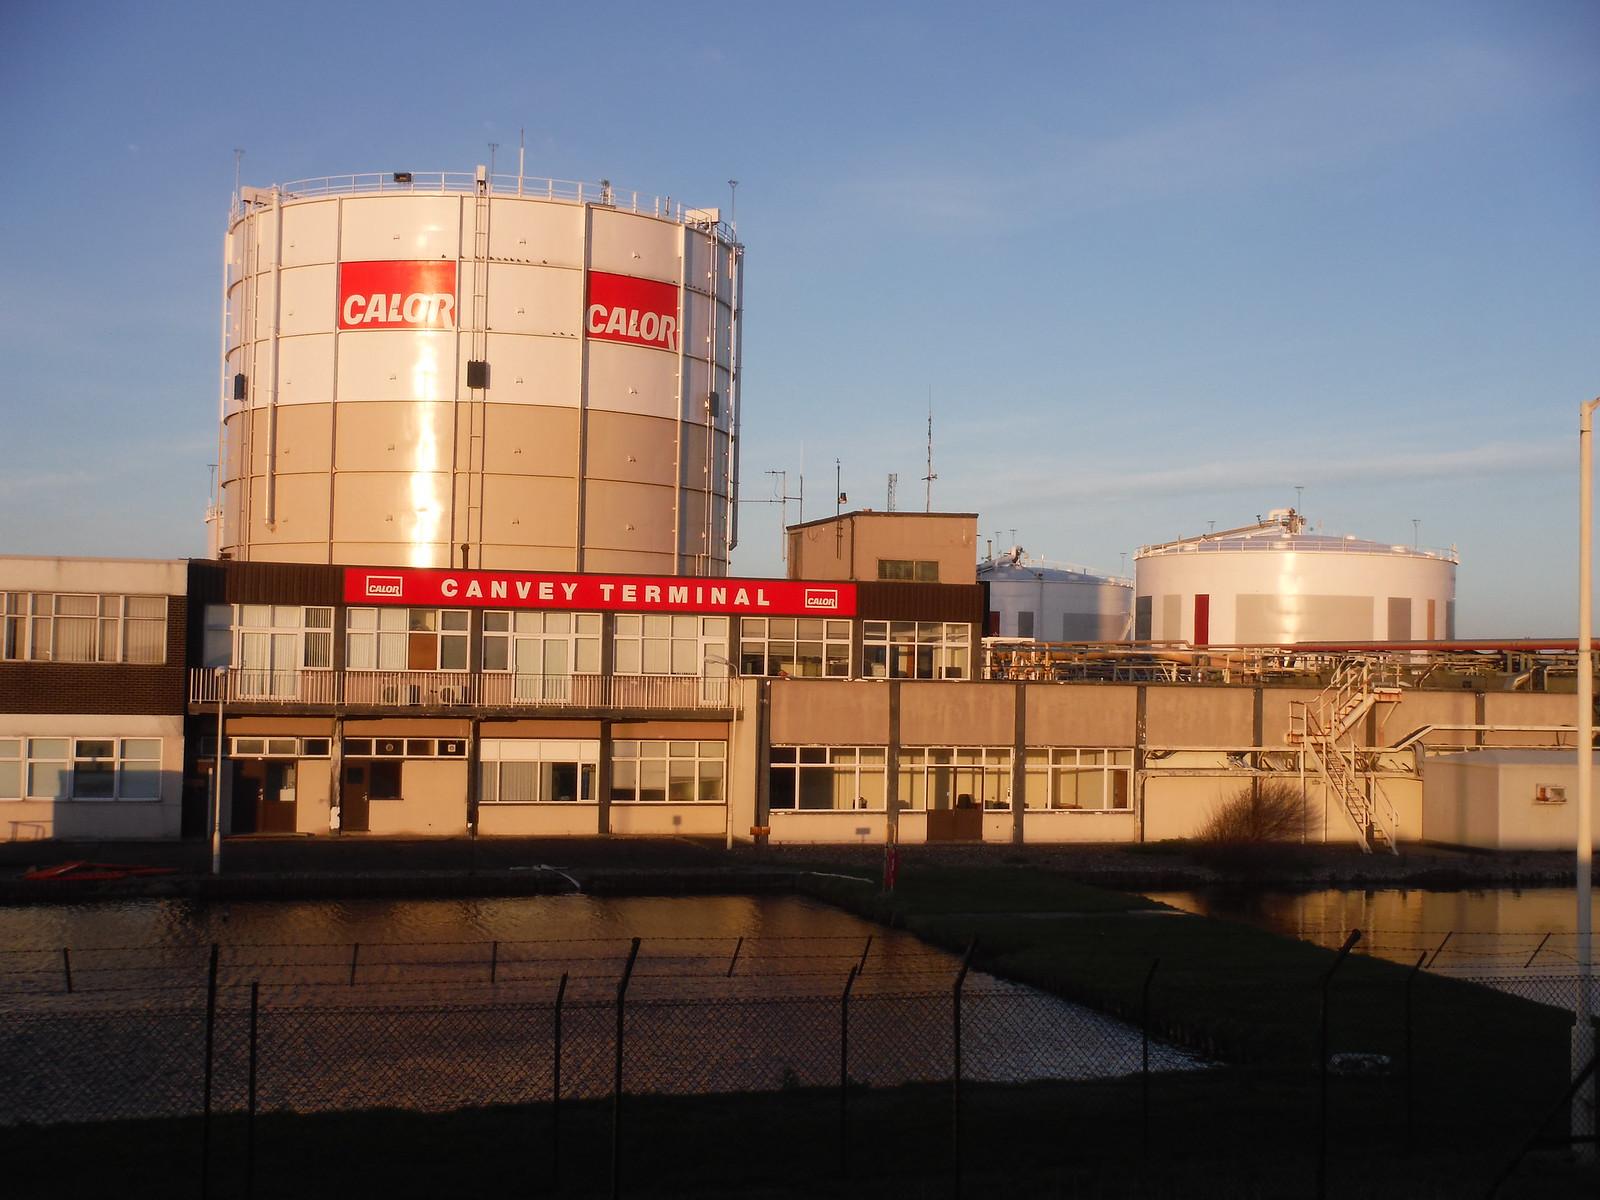 Calor Gas's LNG Terminal, Canvey Island SWC Walk 258 Benfleet Circular (via Canvey Island)